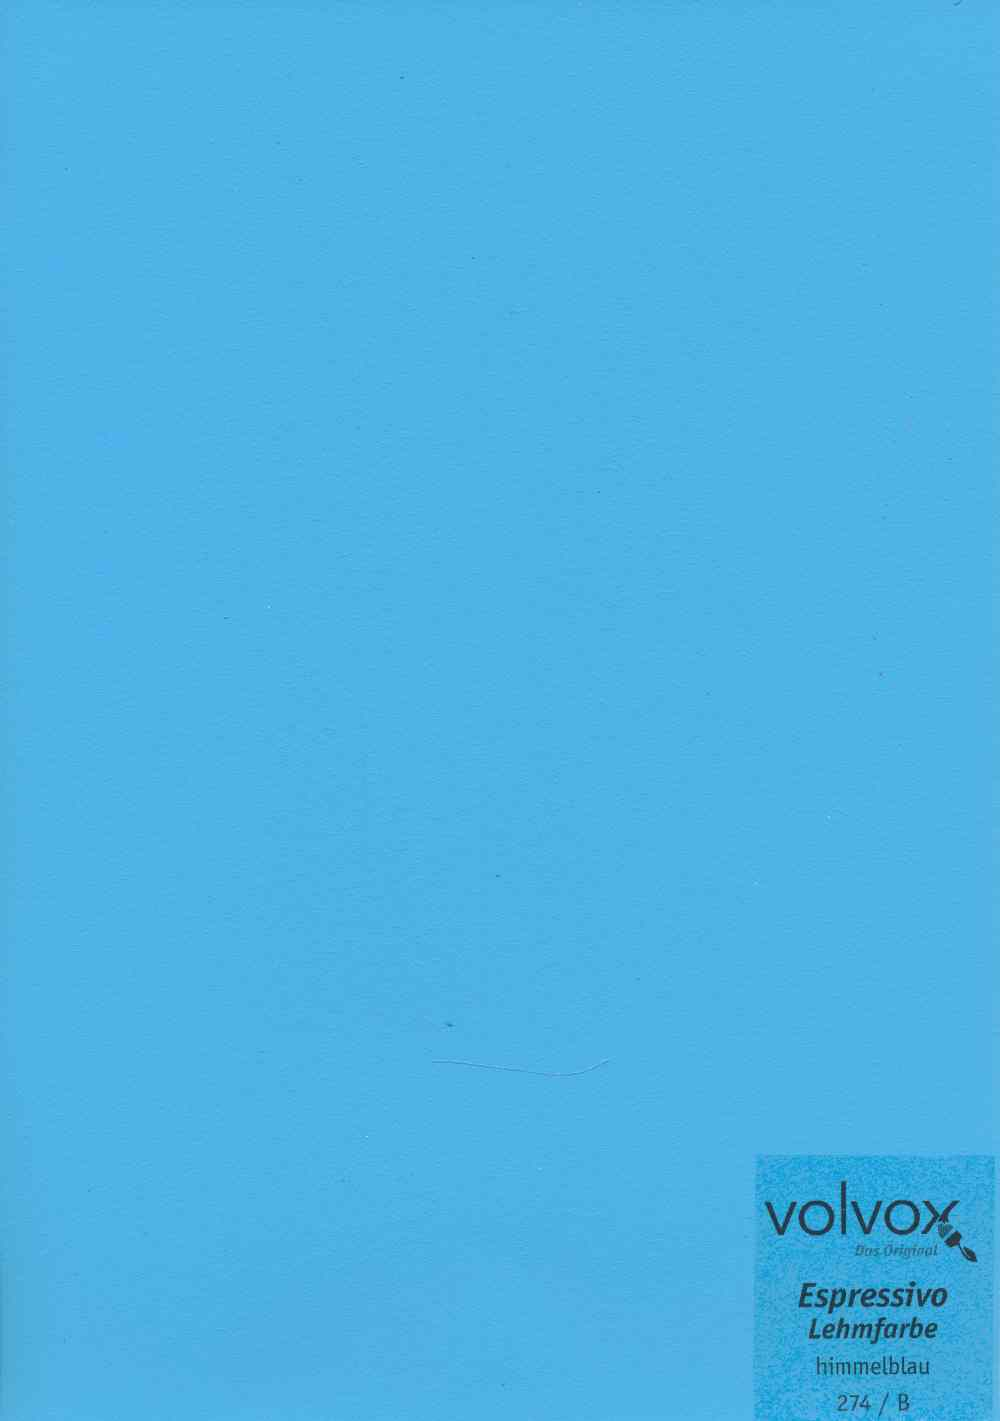 Volvox Espressivo Lehmfarbe 274 himmelblau